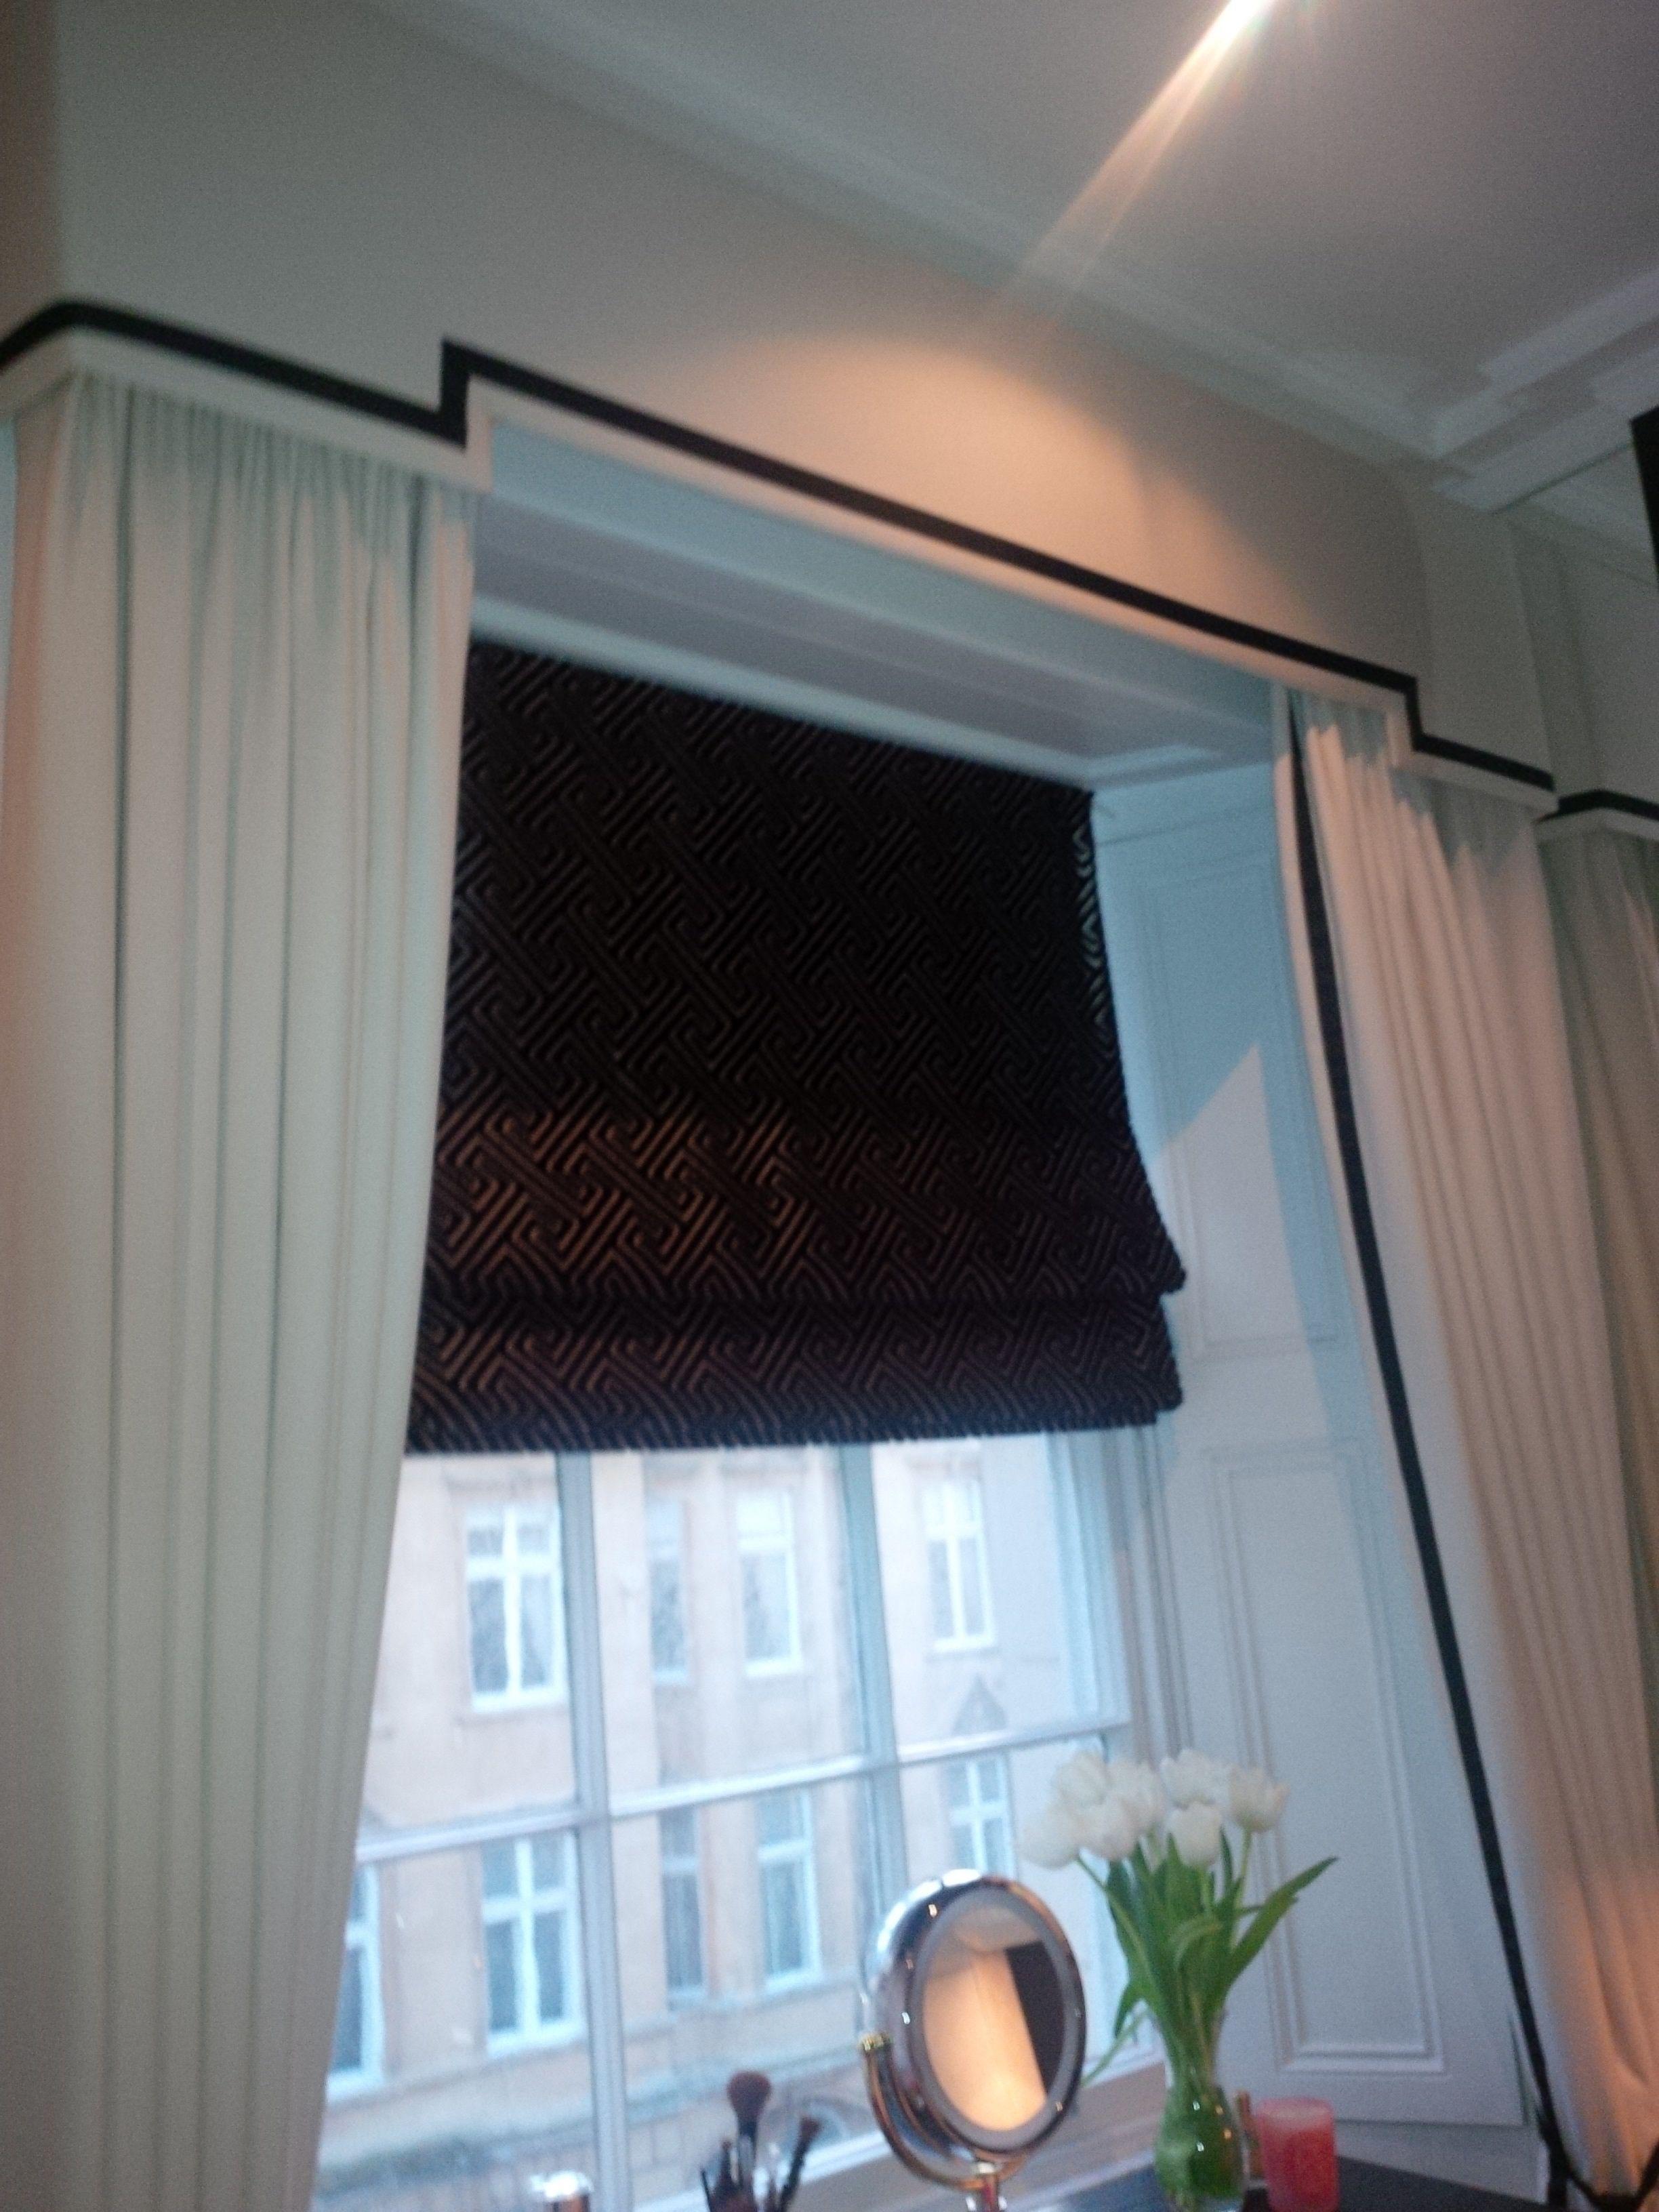 Dress Curtains Pelmet Roman Blind Add Some Sheer